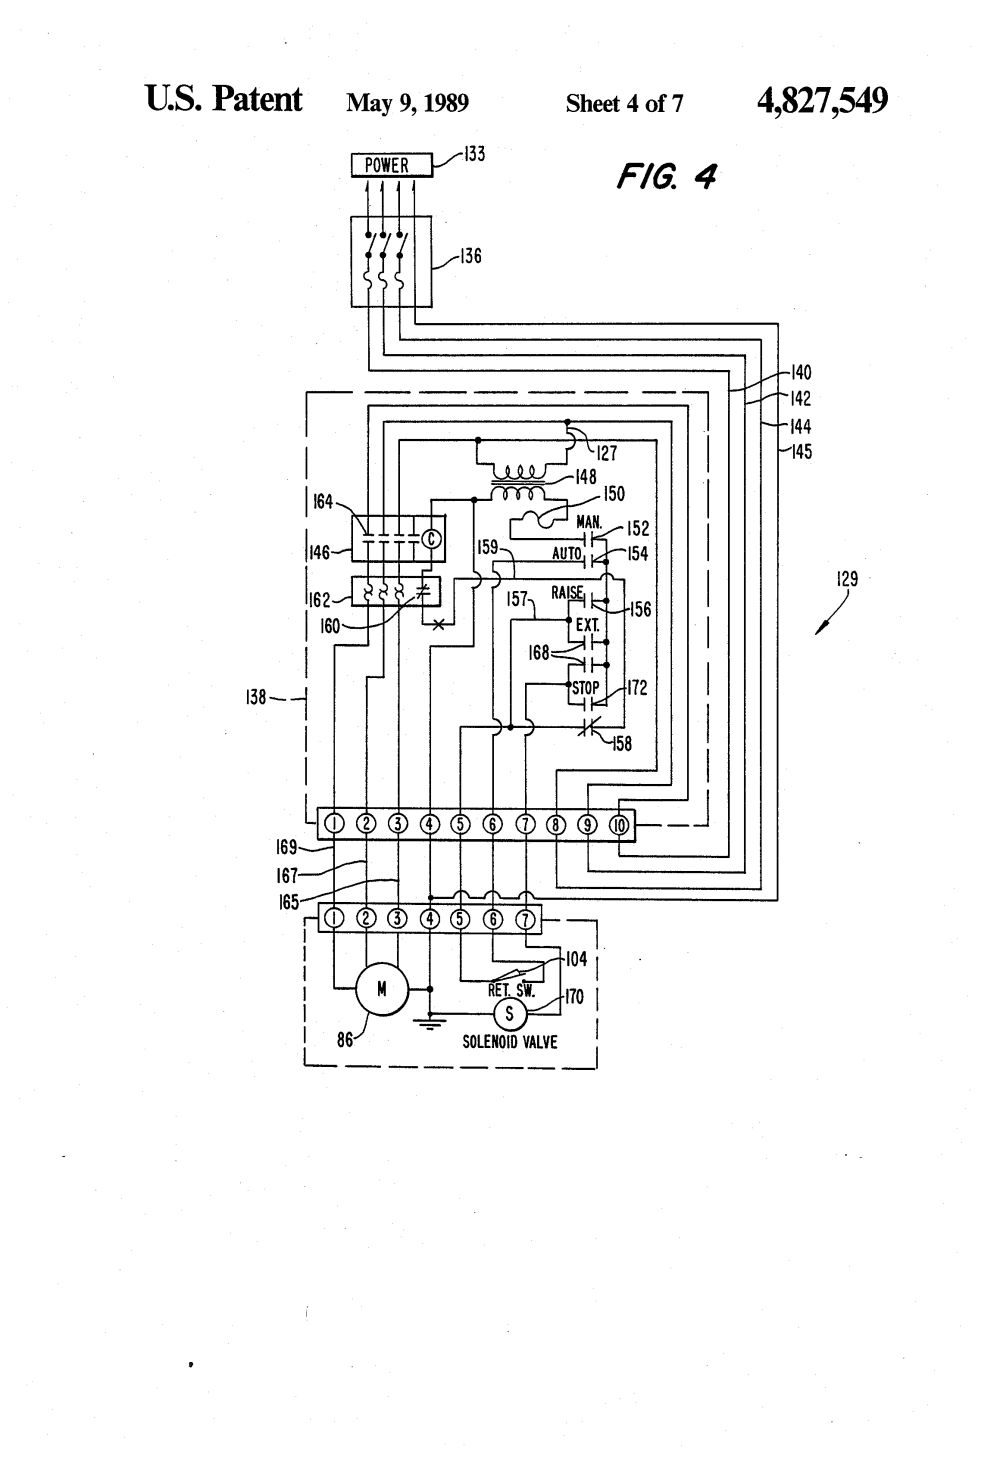 medium resolution of dock leveler wiring diagram wiring diagram hydraulic lift diagram dock leveler schematic wiring diagramdock leveler wiring